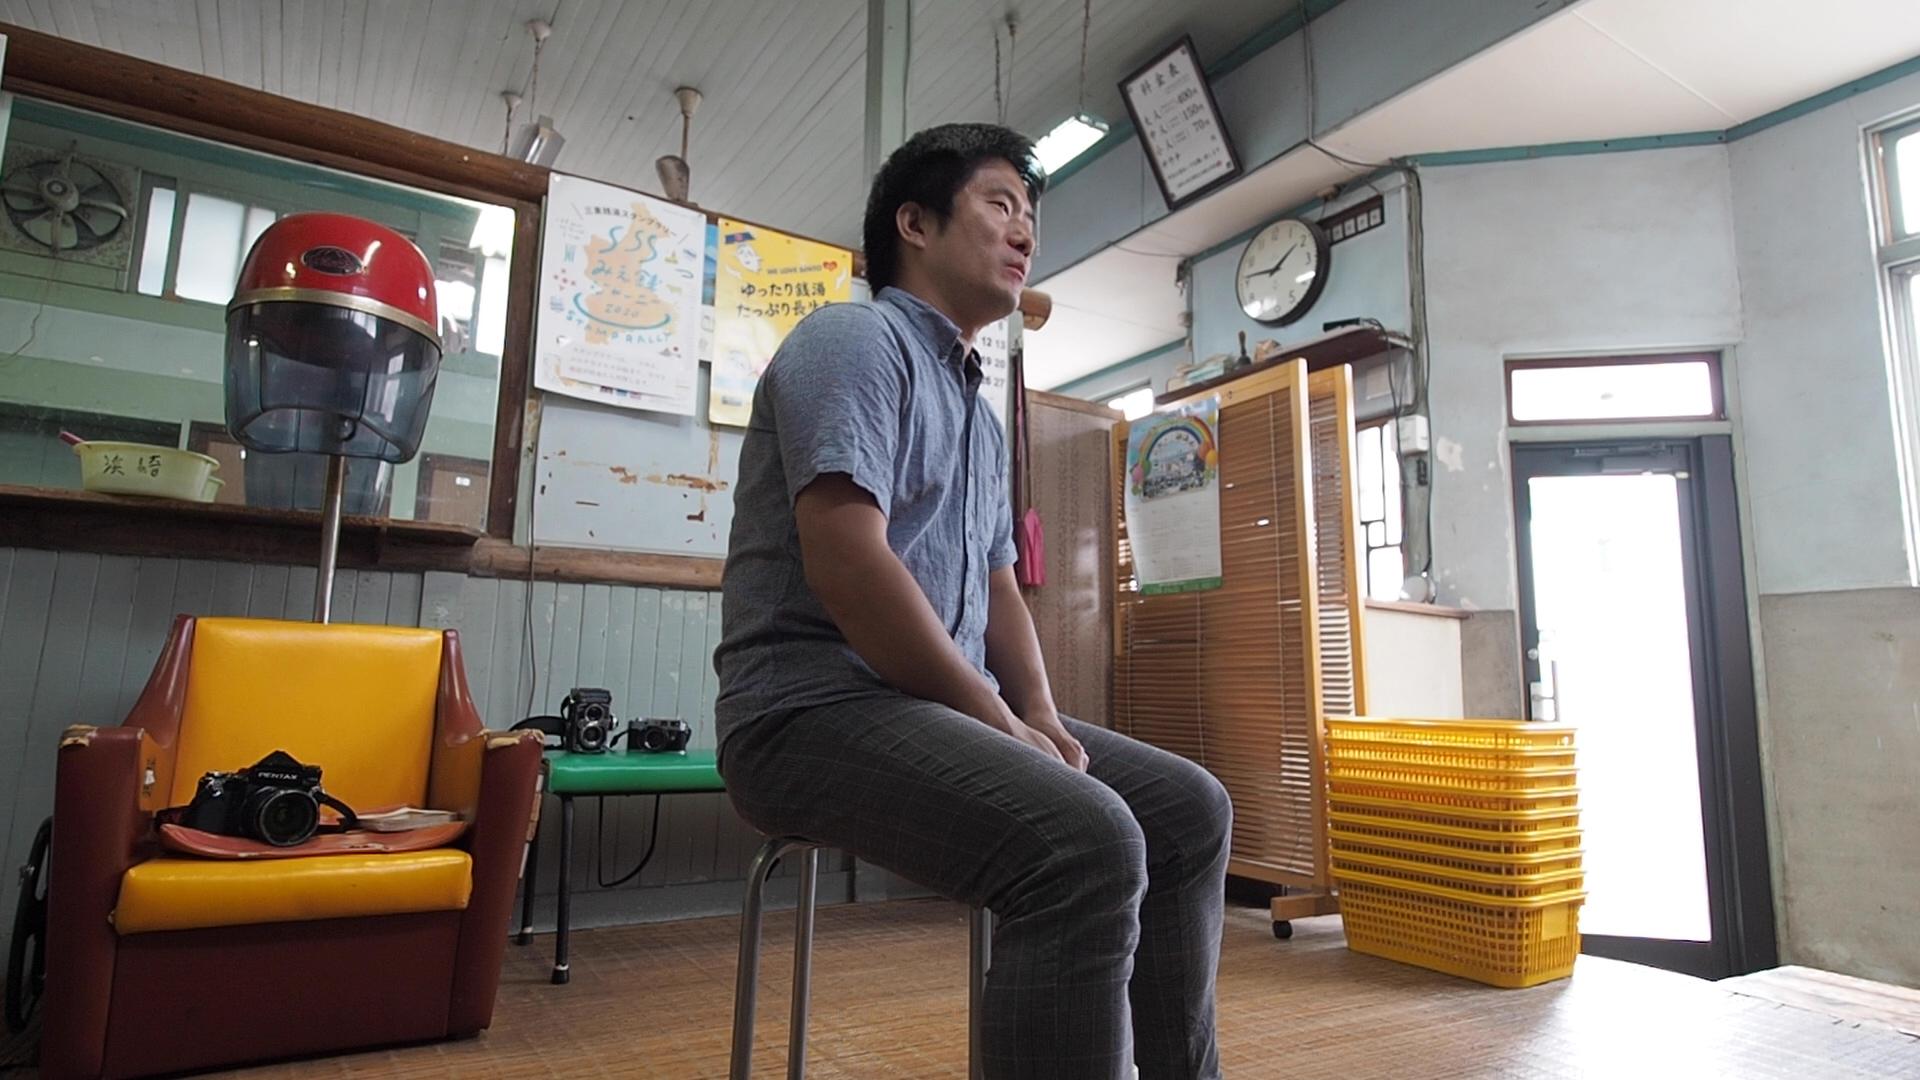 200905NAGI82号Monochrome澤田勝行取材風景